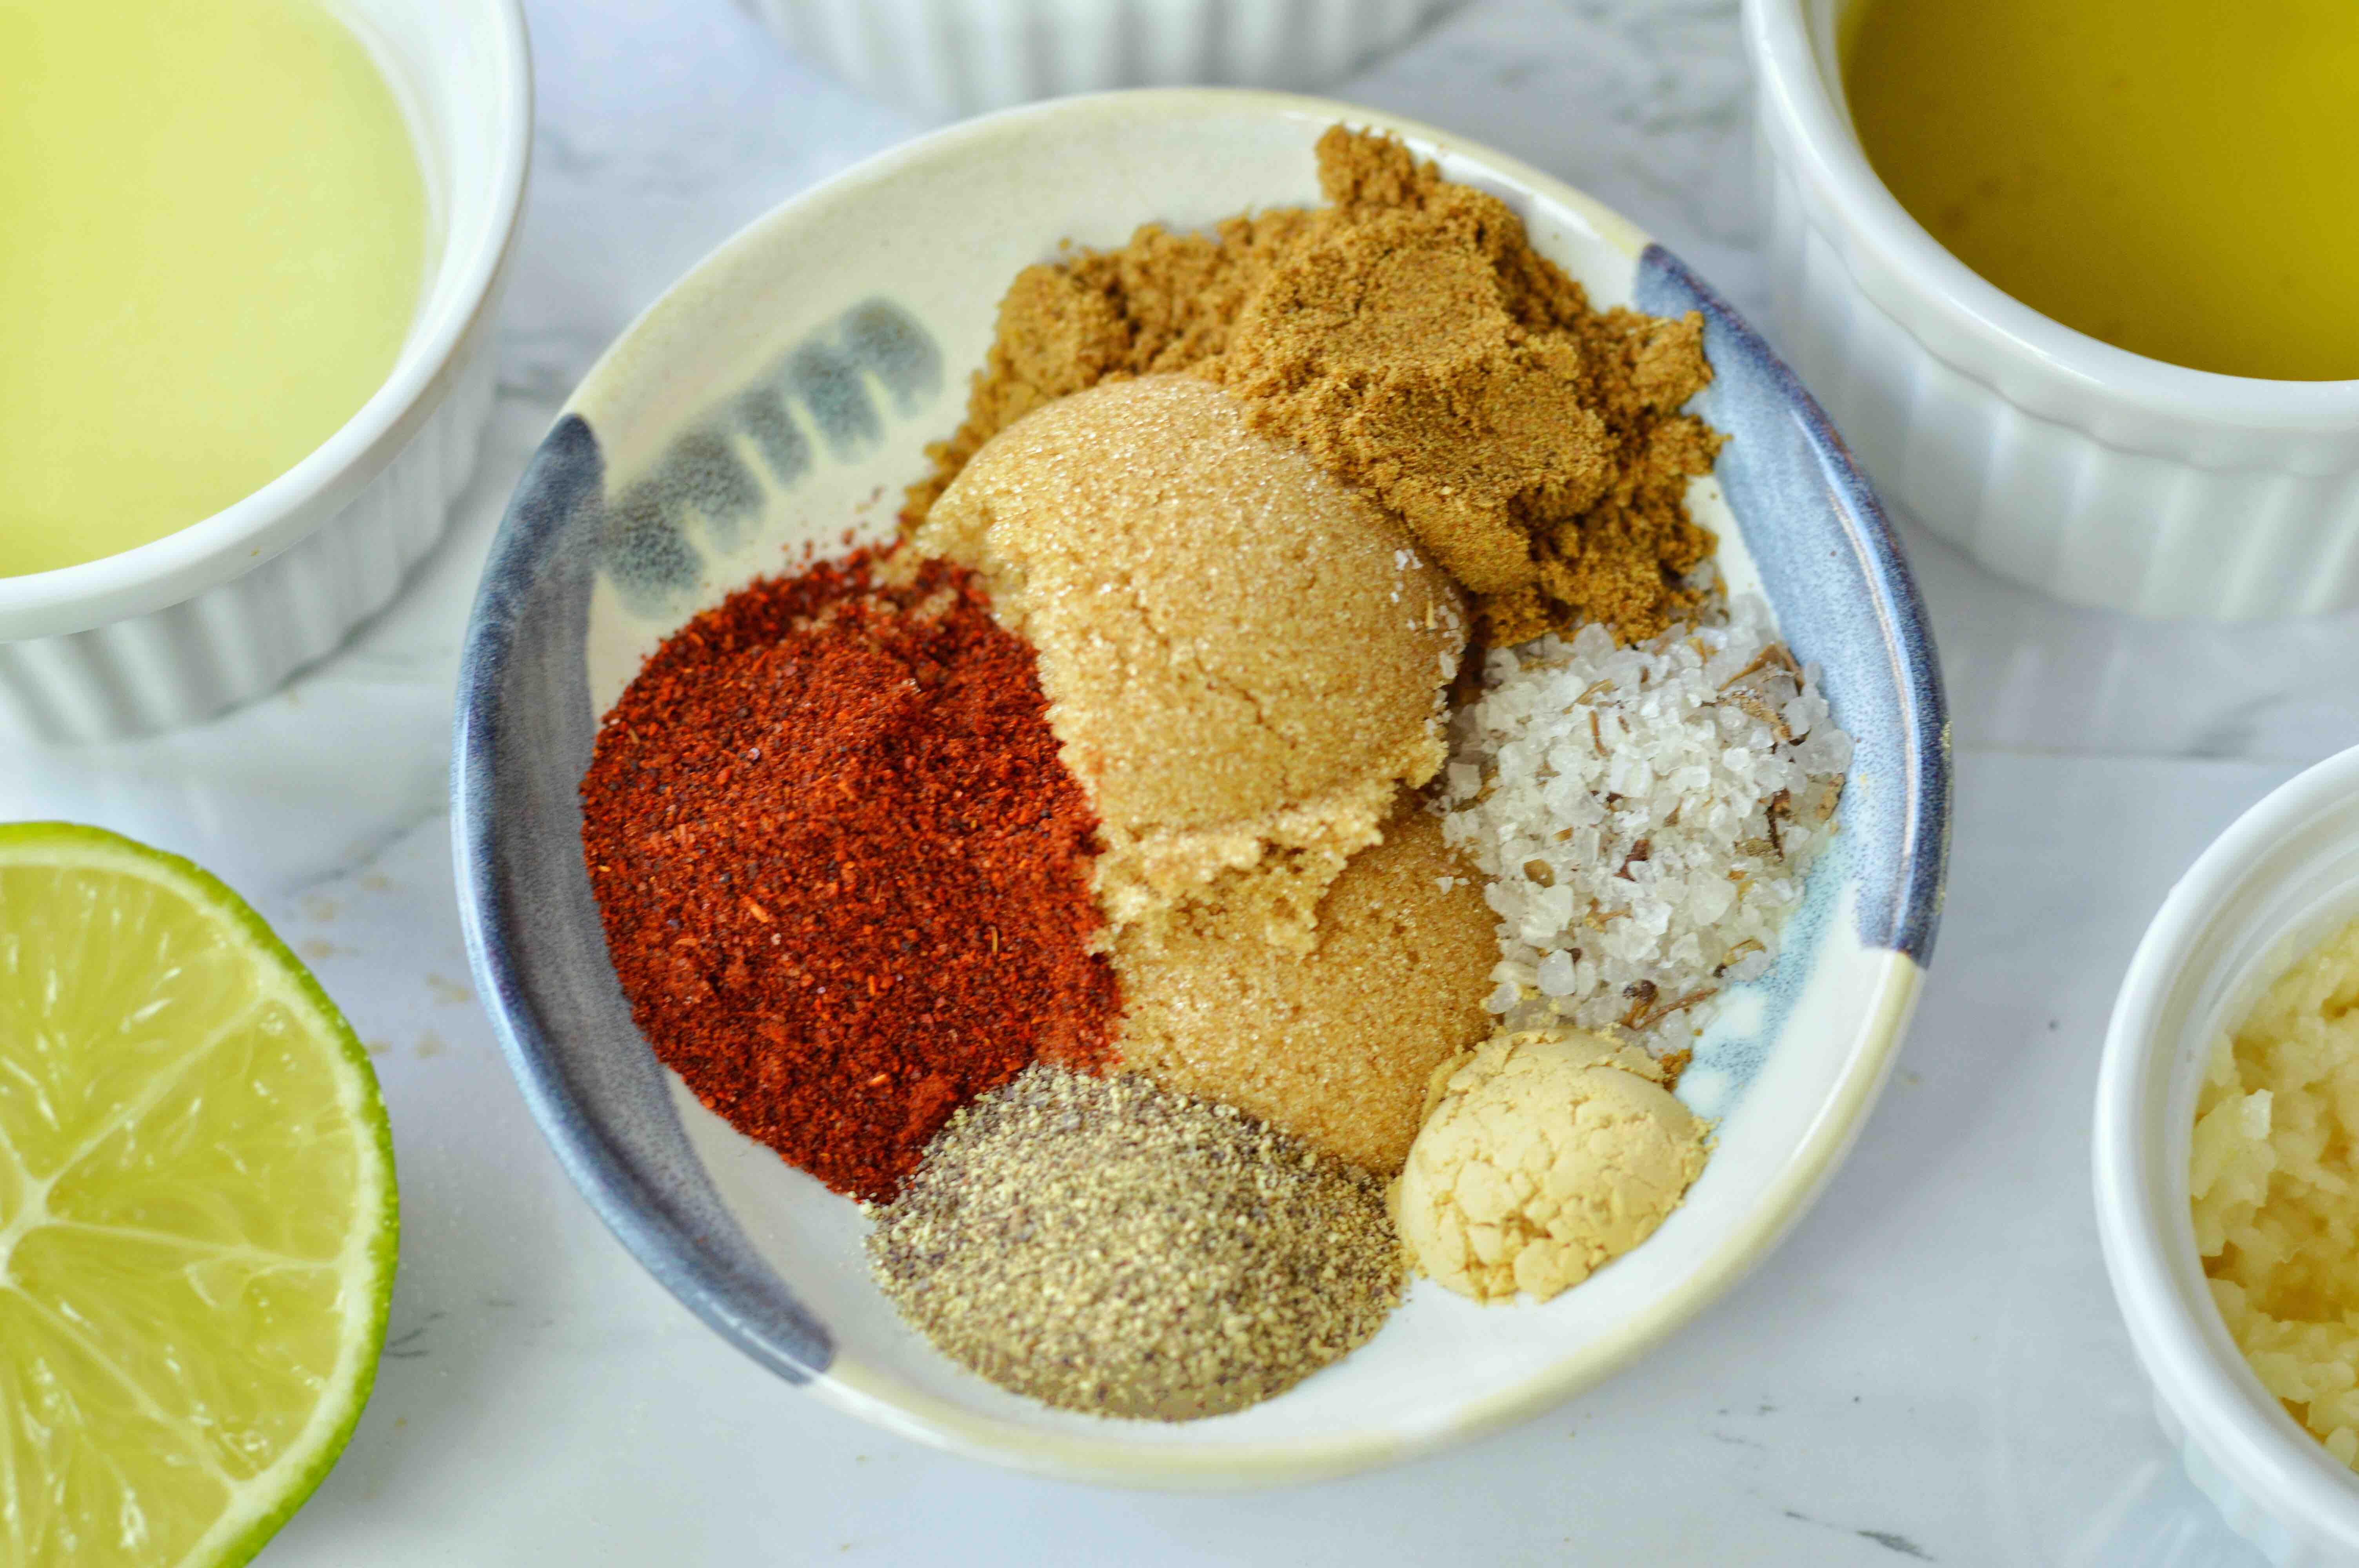 spices for marinade for sheet pan chicken fajitas